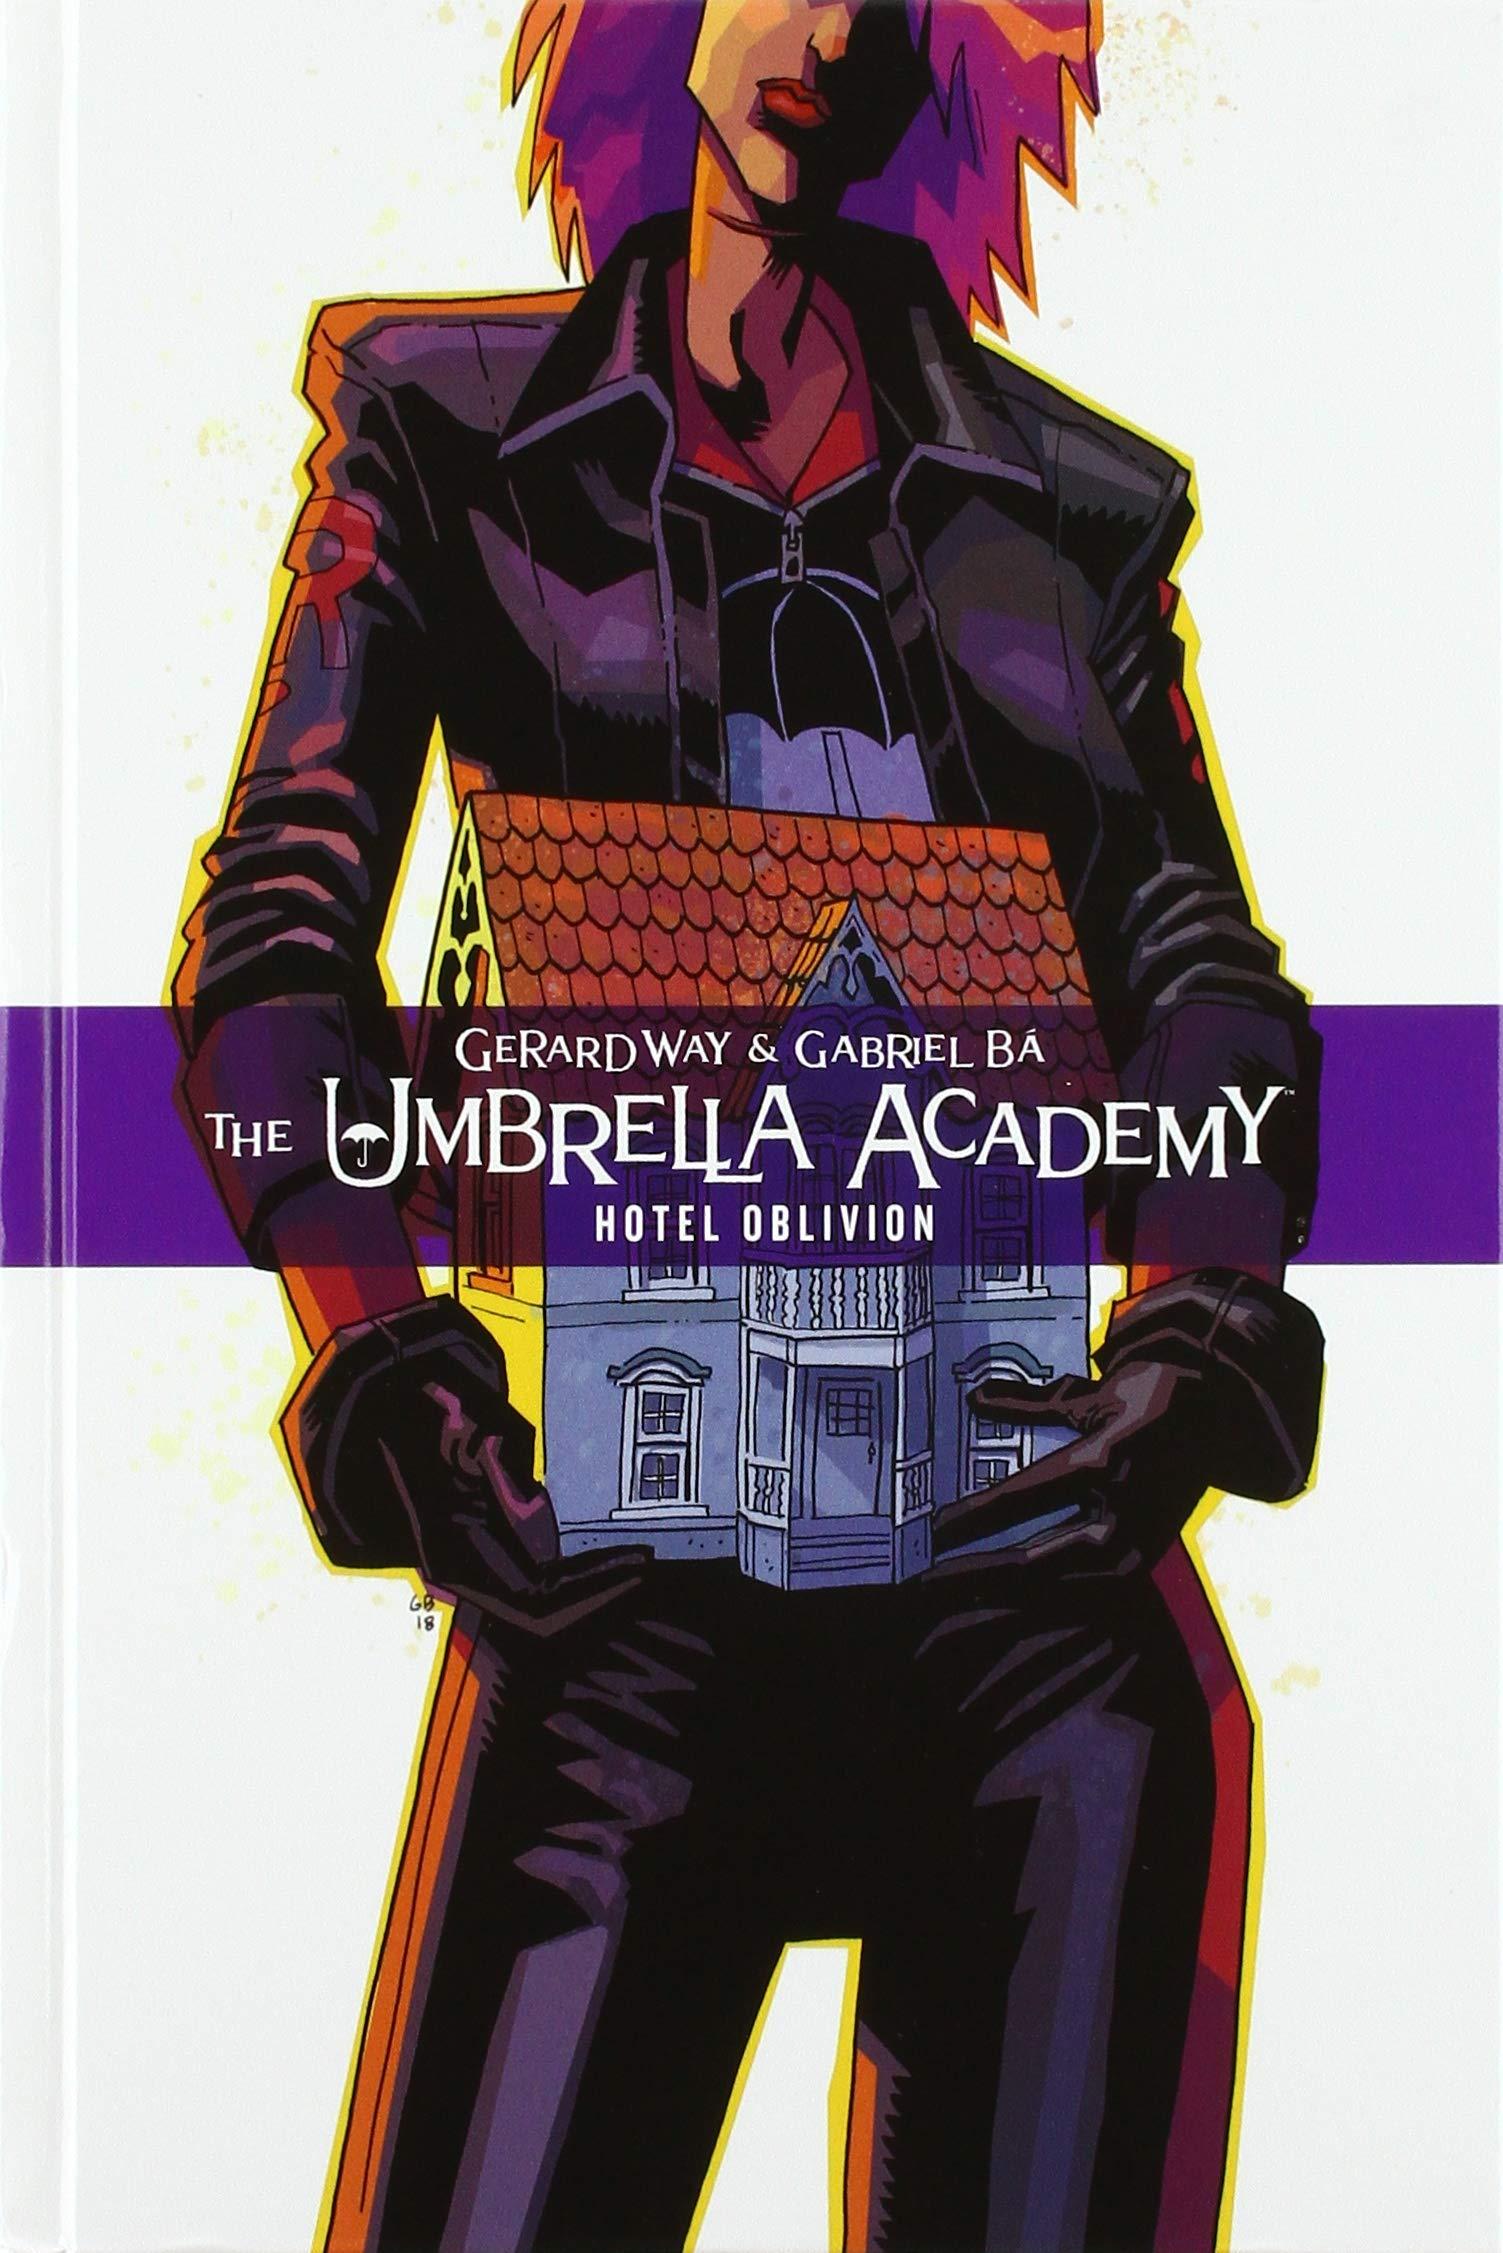 The Umbrella Academy 3  Hotel Oblivion